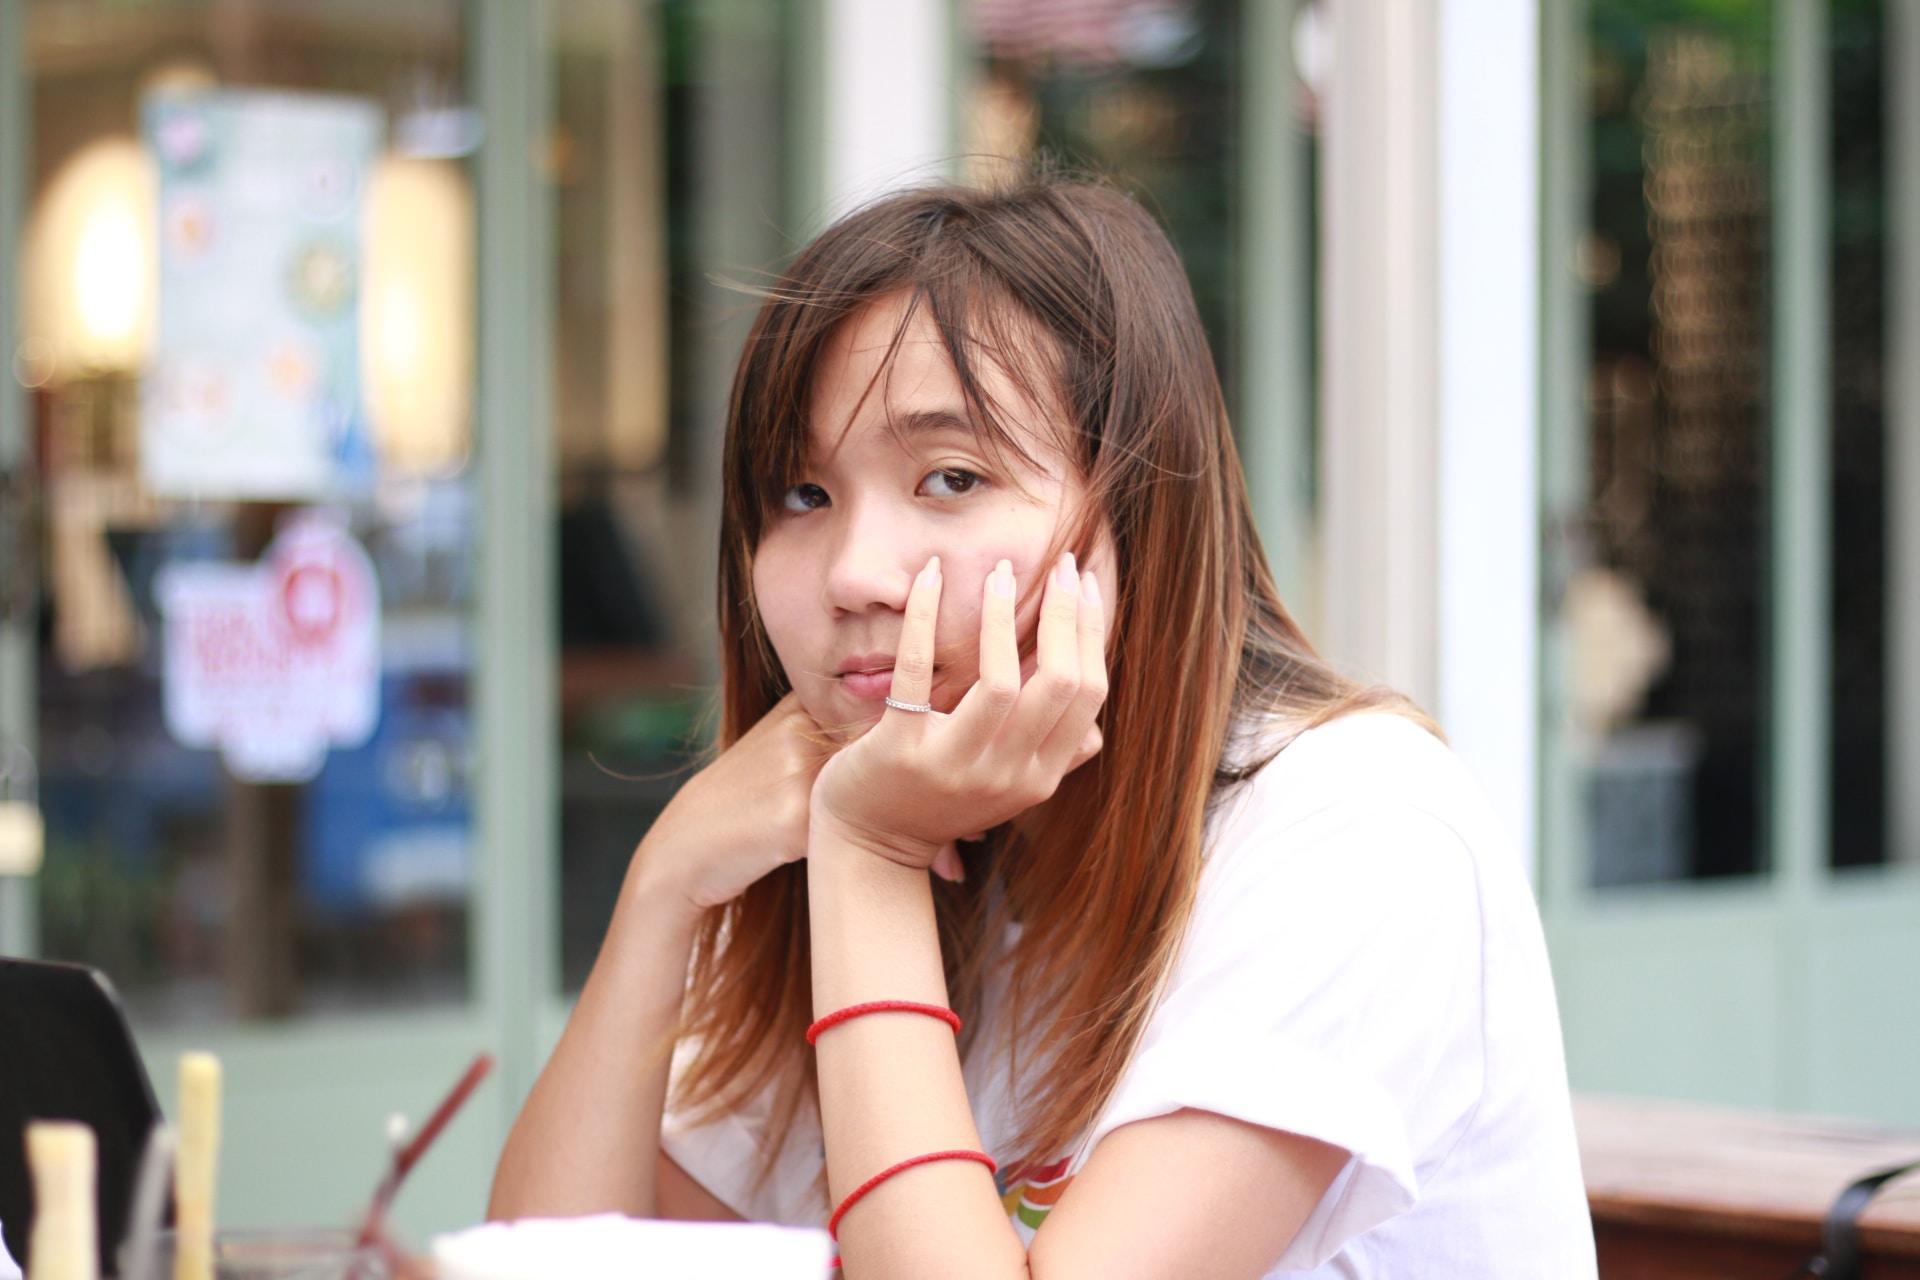 Go to Chansereypich Seng's profile